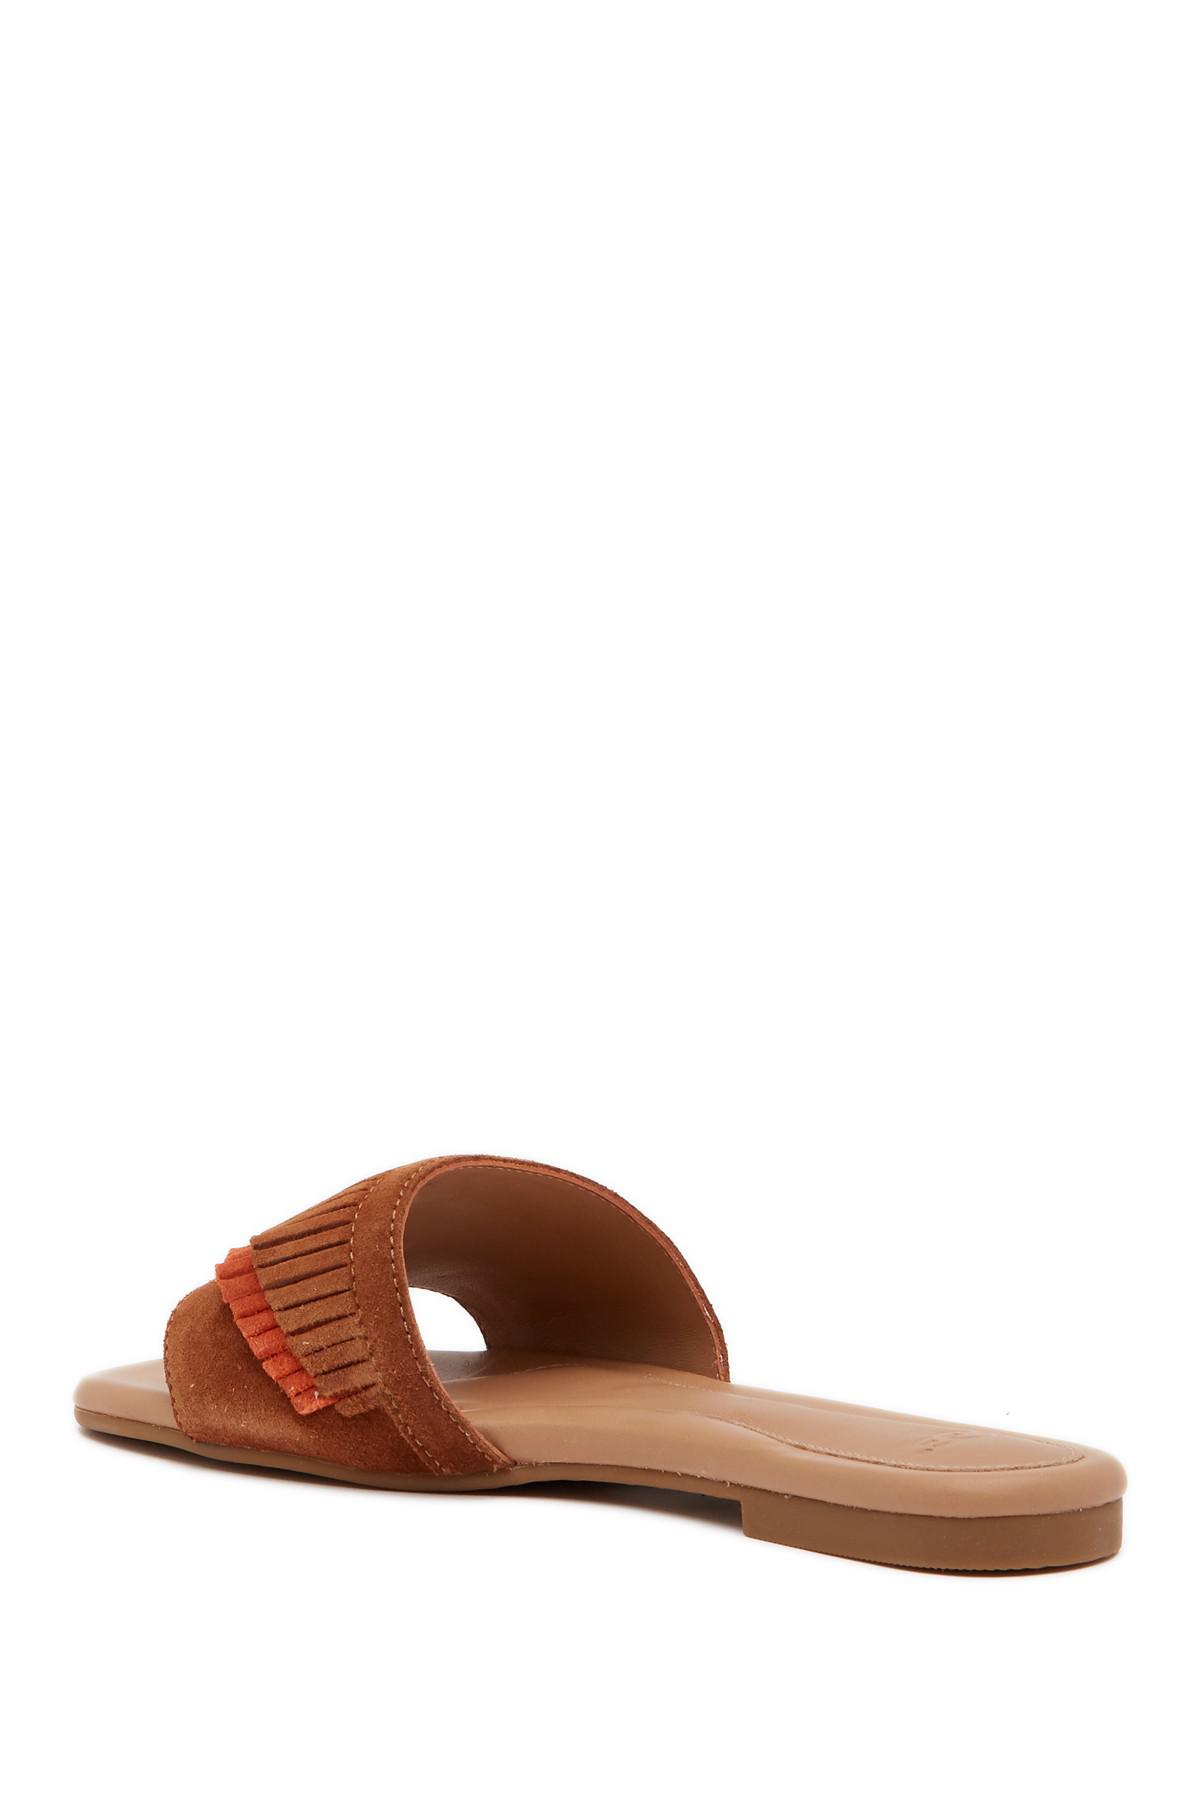 ec0c93442732 Lyst - UGG Binx Fringe Thong Sandal in Brown